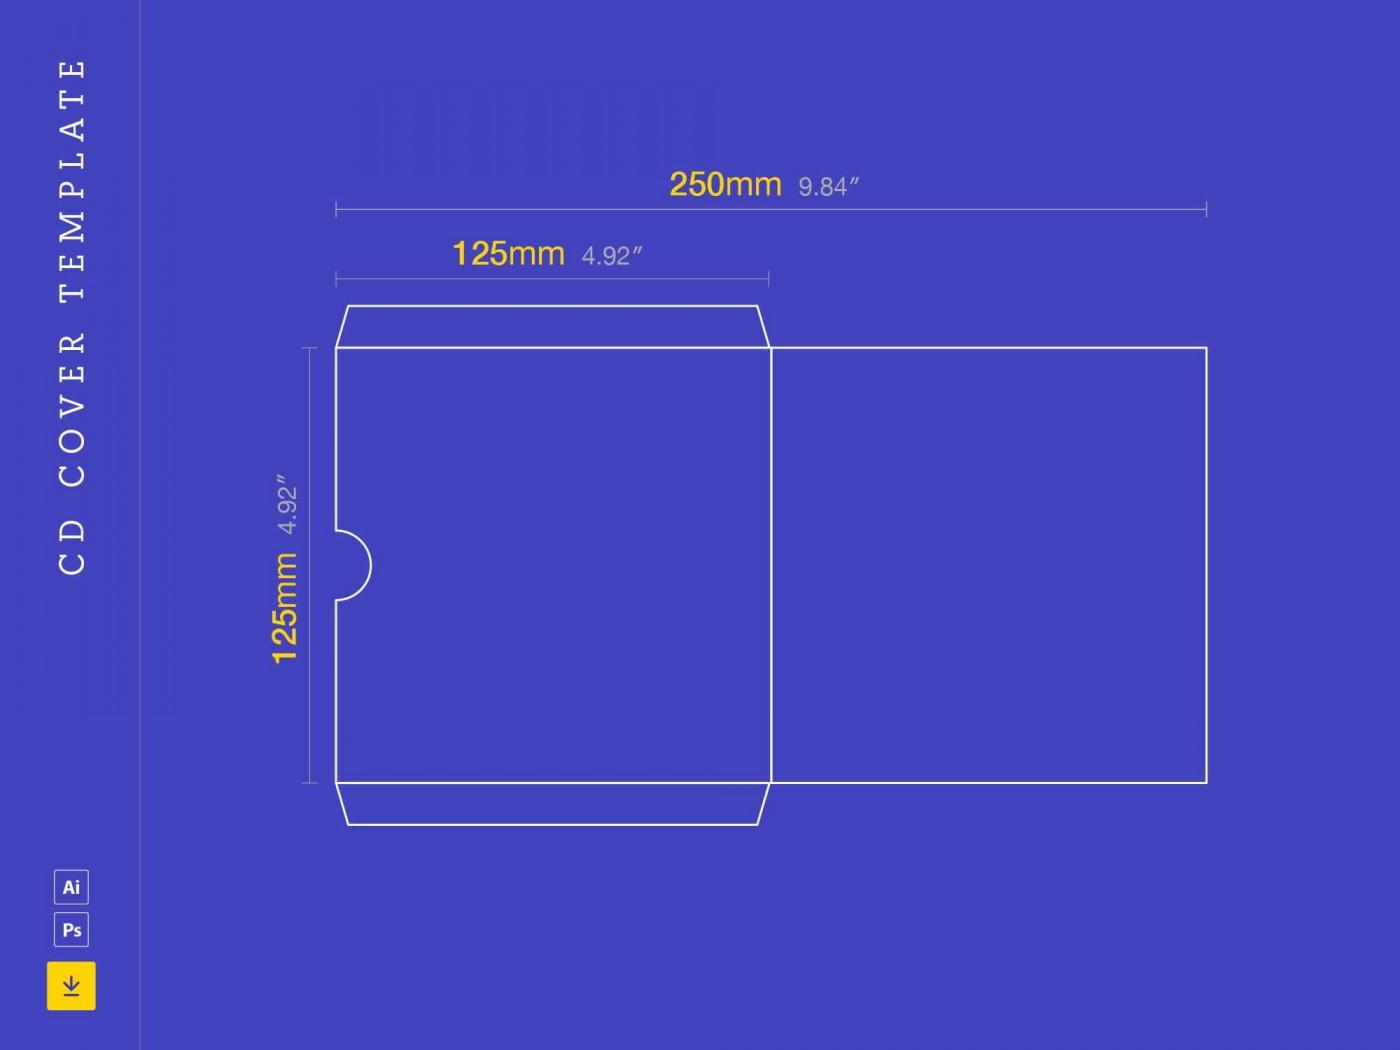 003 Fantastic Cd Cover Design Template Photoshop Sample  Label Psd Free1400